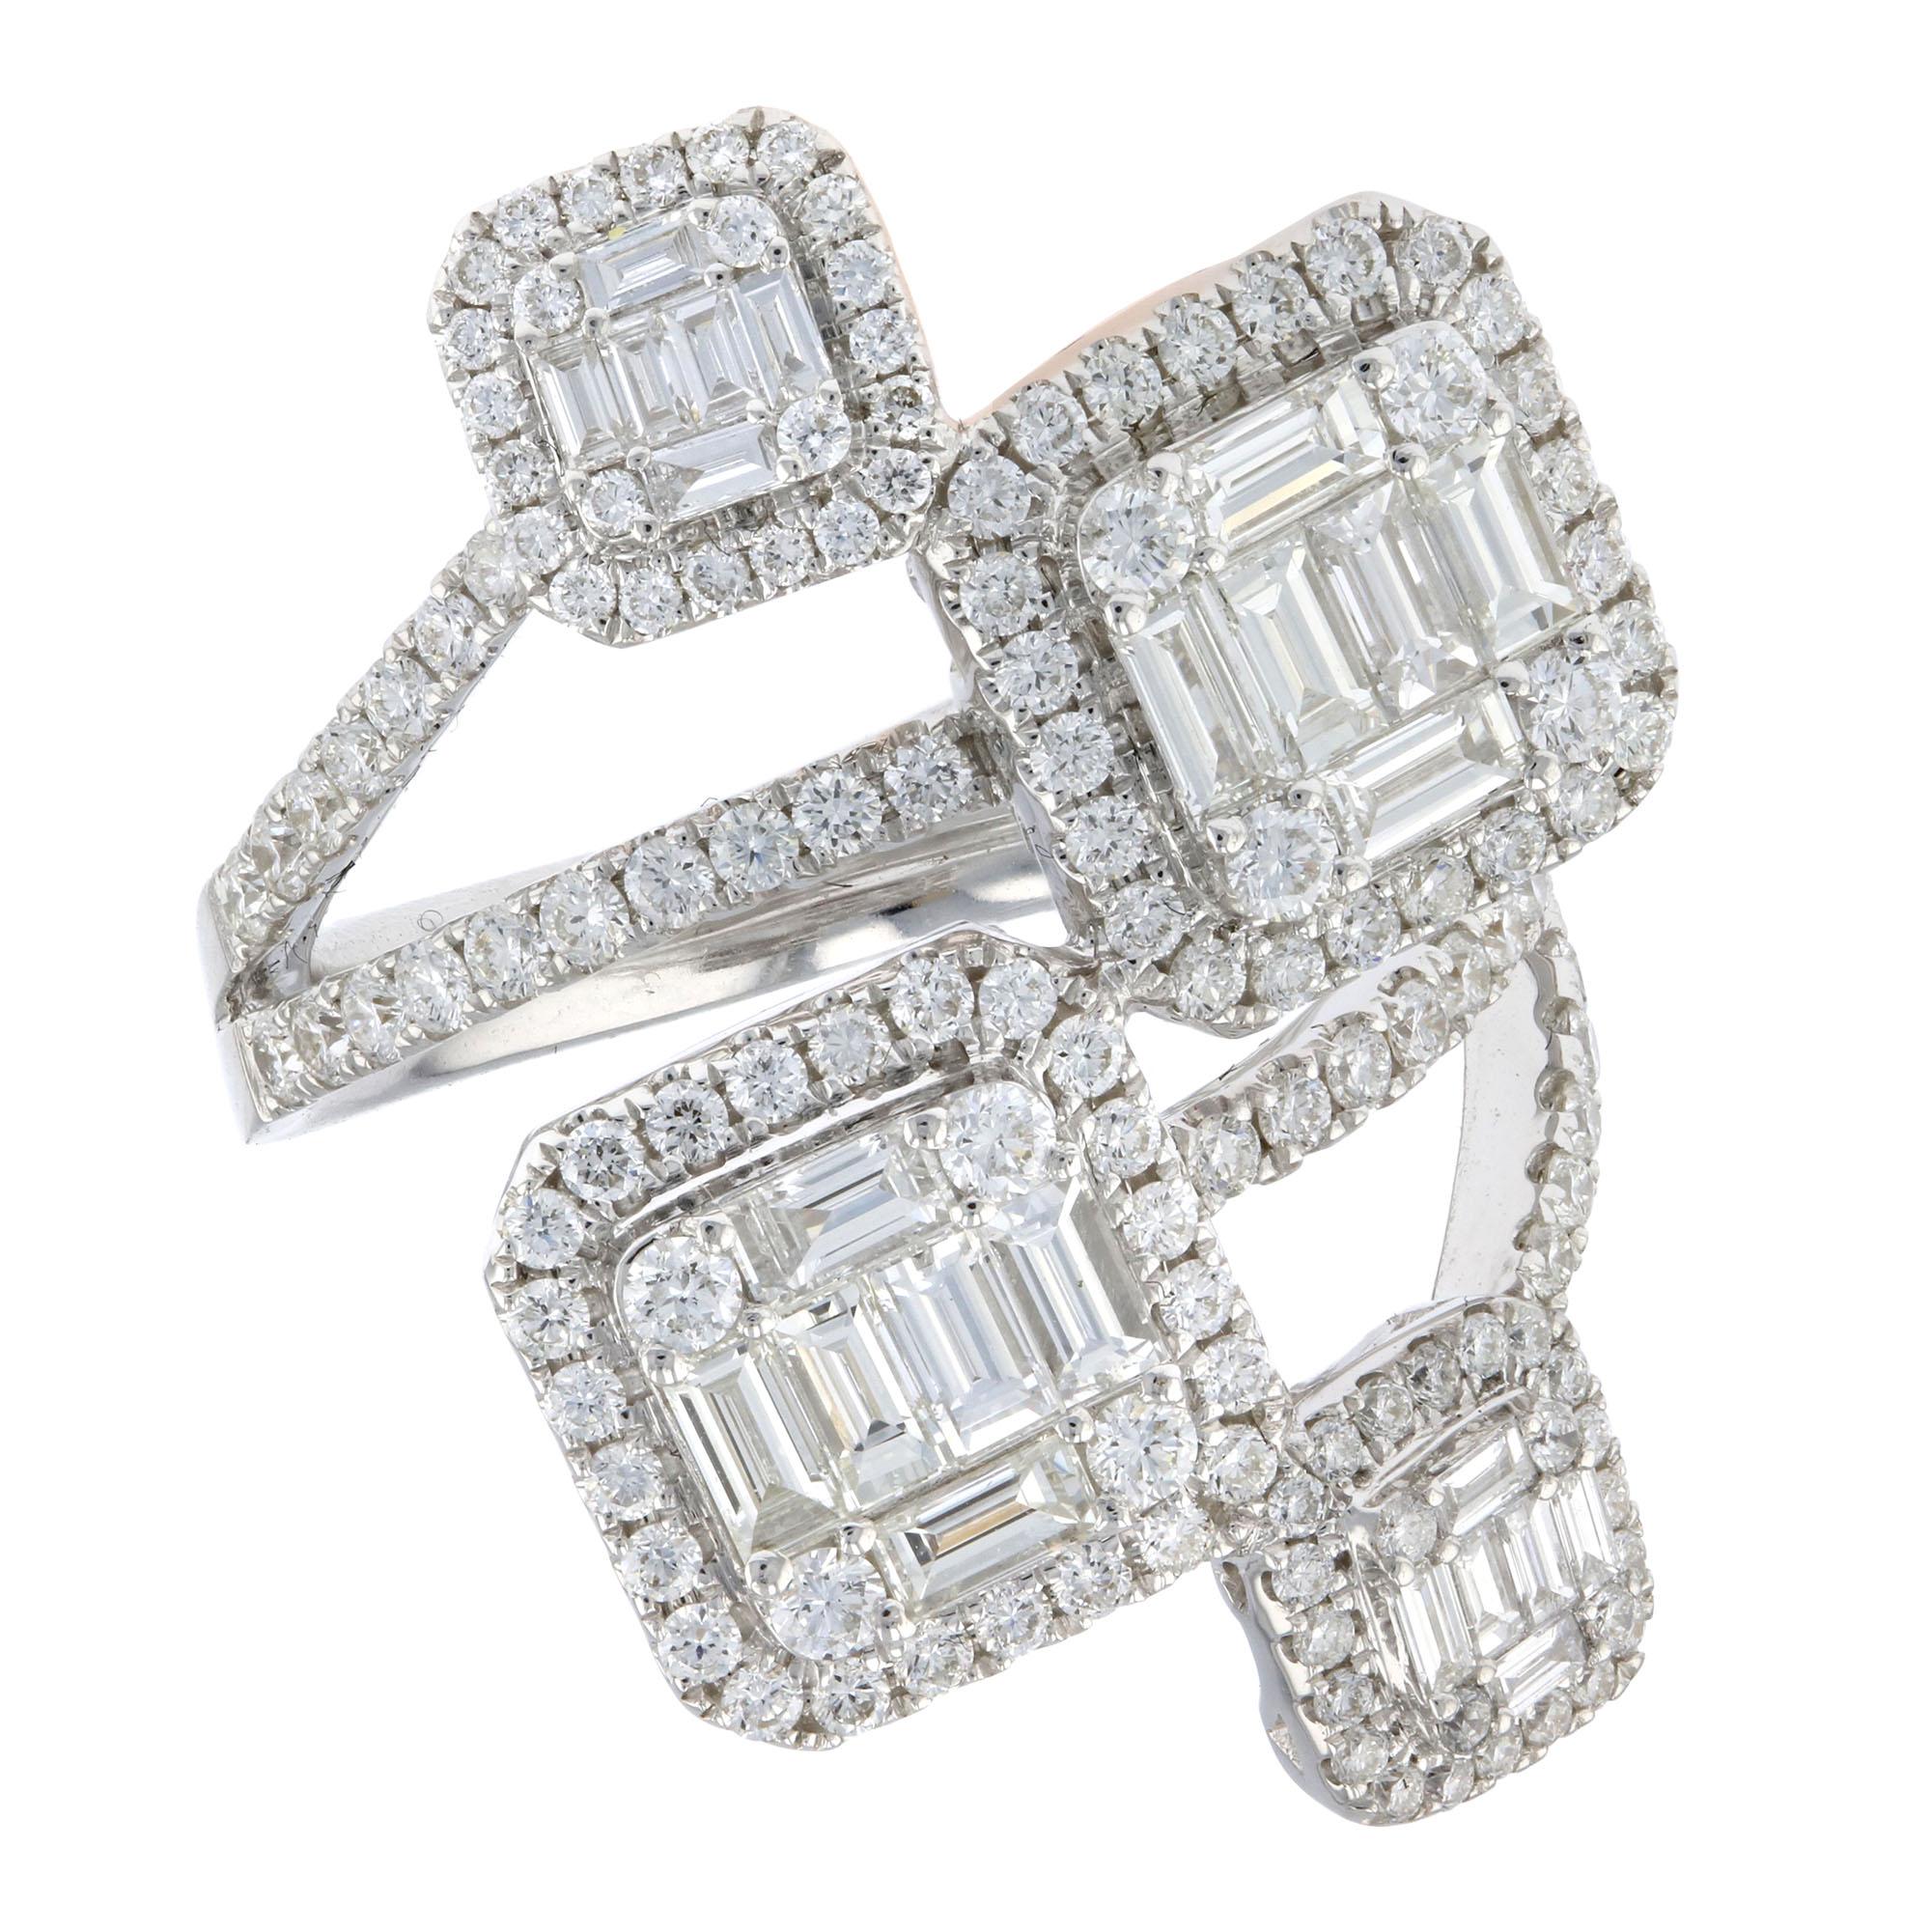 View 2.23ctw Diamond Wedding Band in 18k White Gold